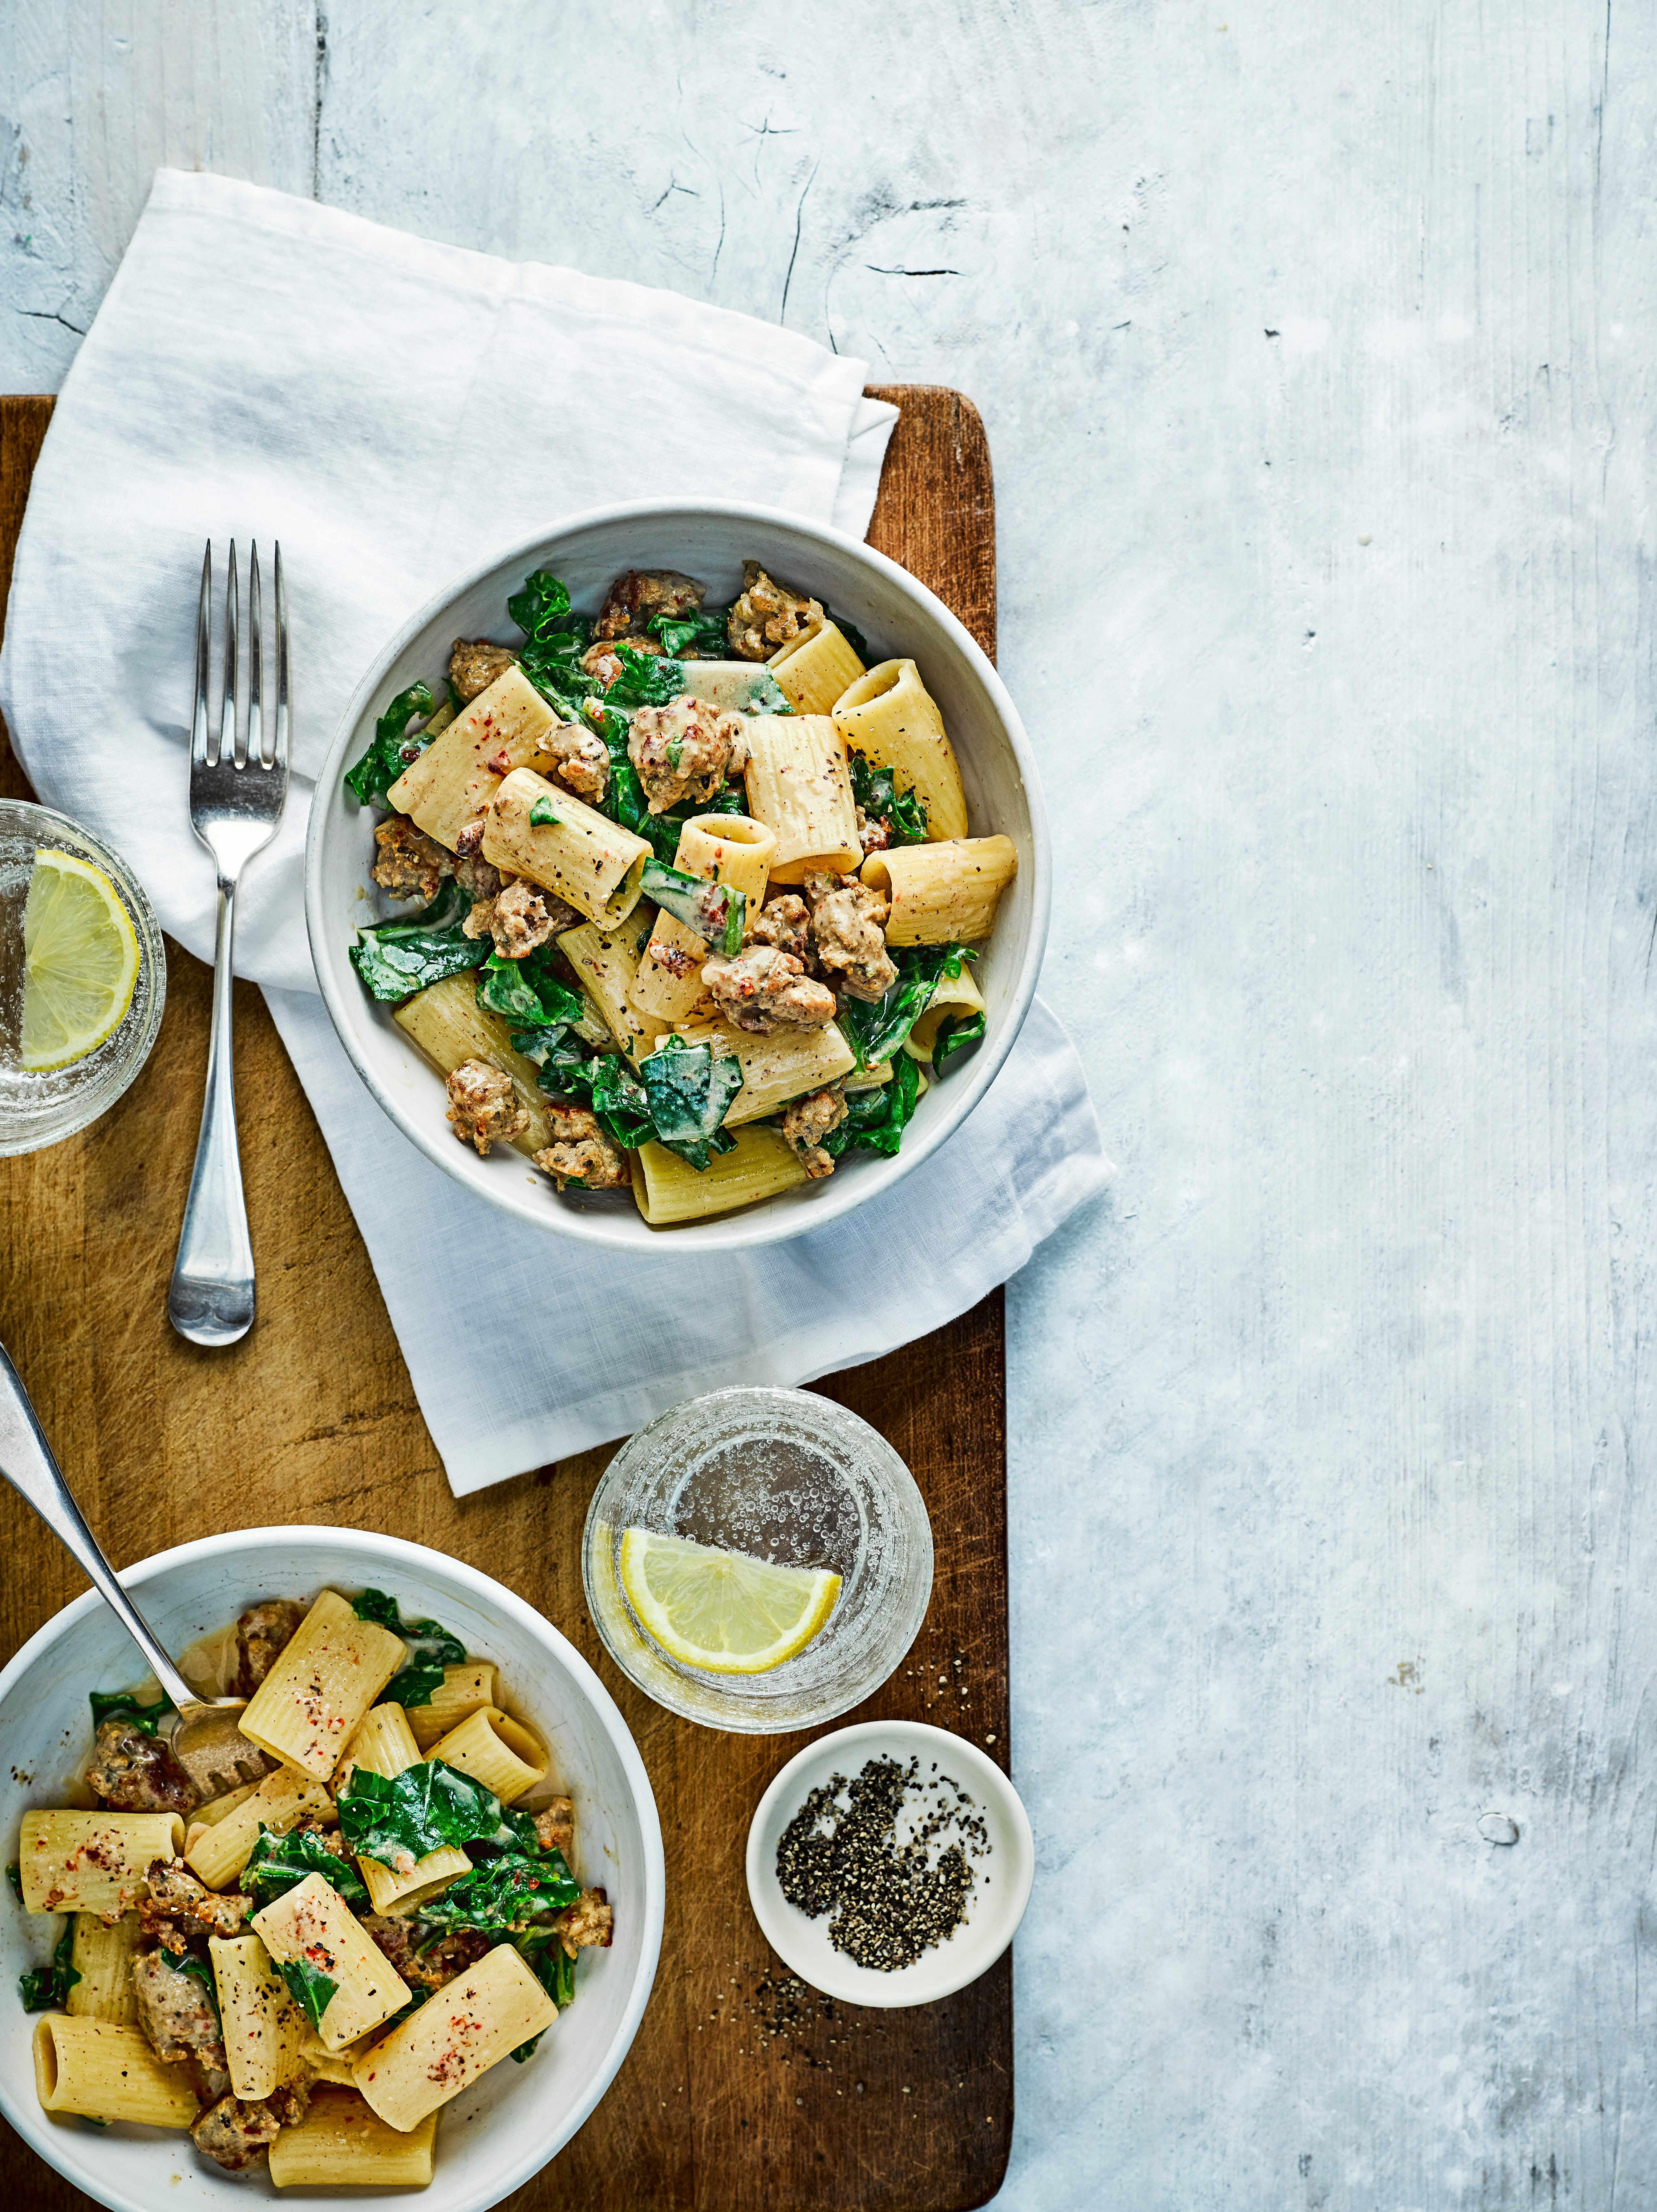 Sausage Pasta Recipe With Kale and Mustard